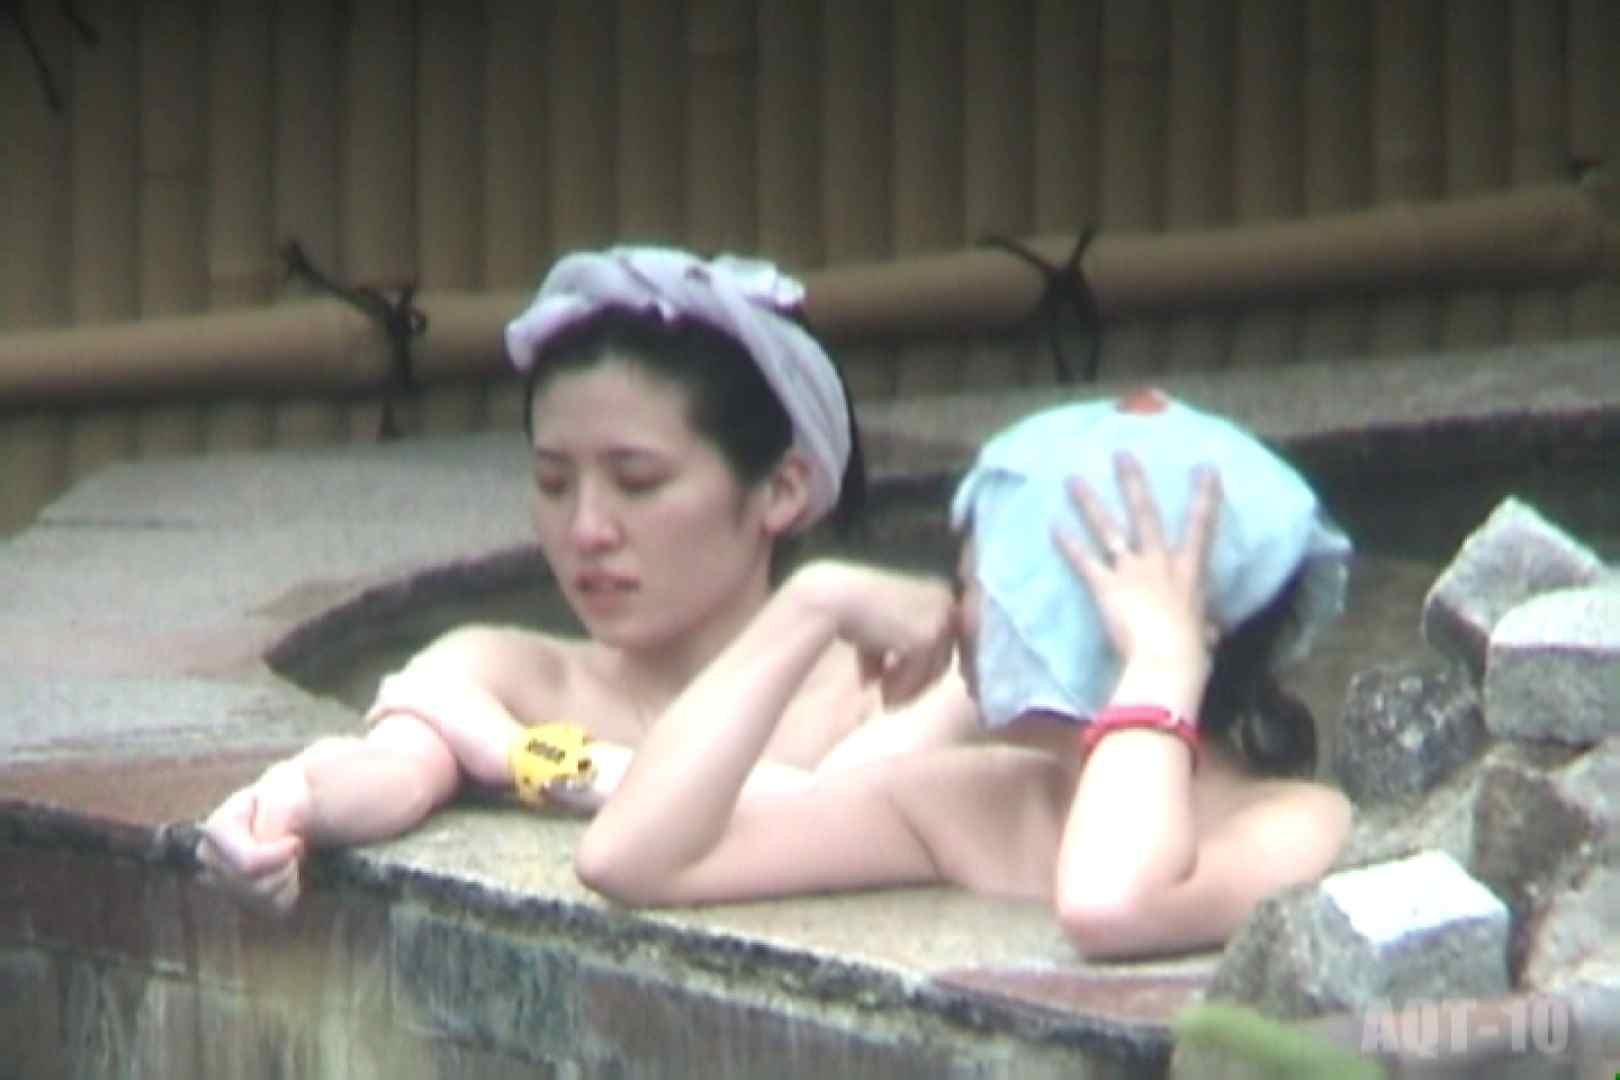 Aquaな露天風呂Vol.793 露天 | OLセックス  94画像 43